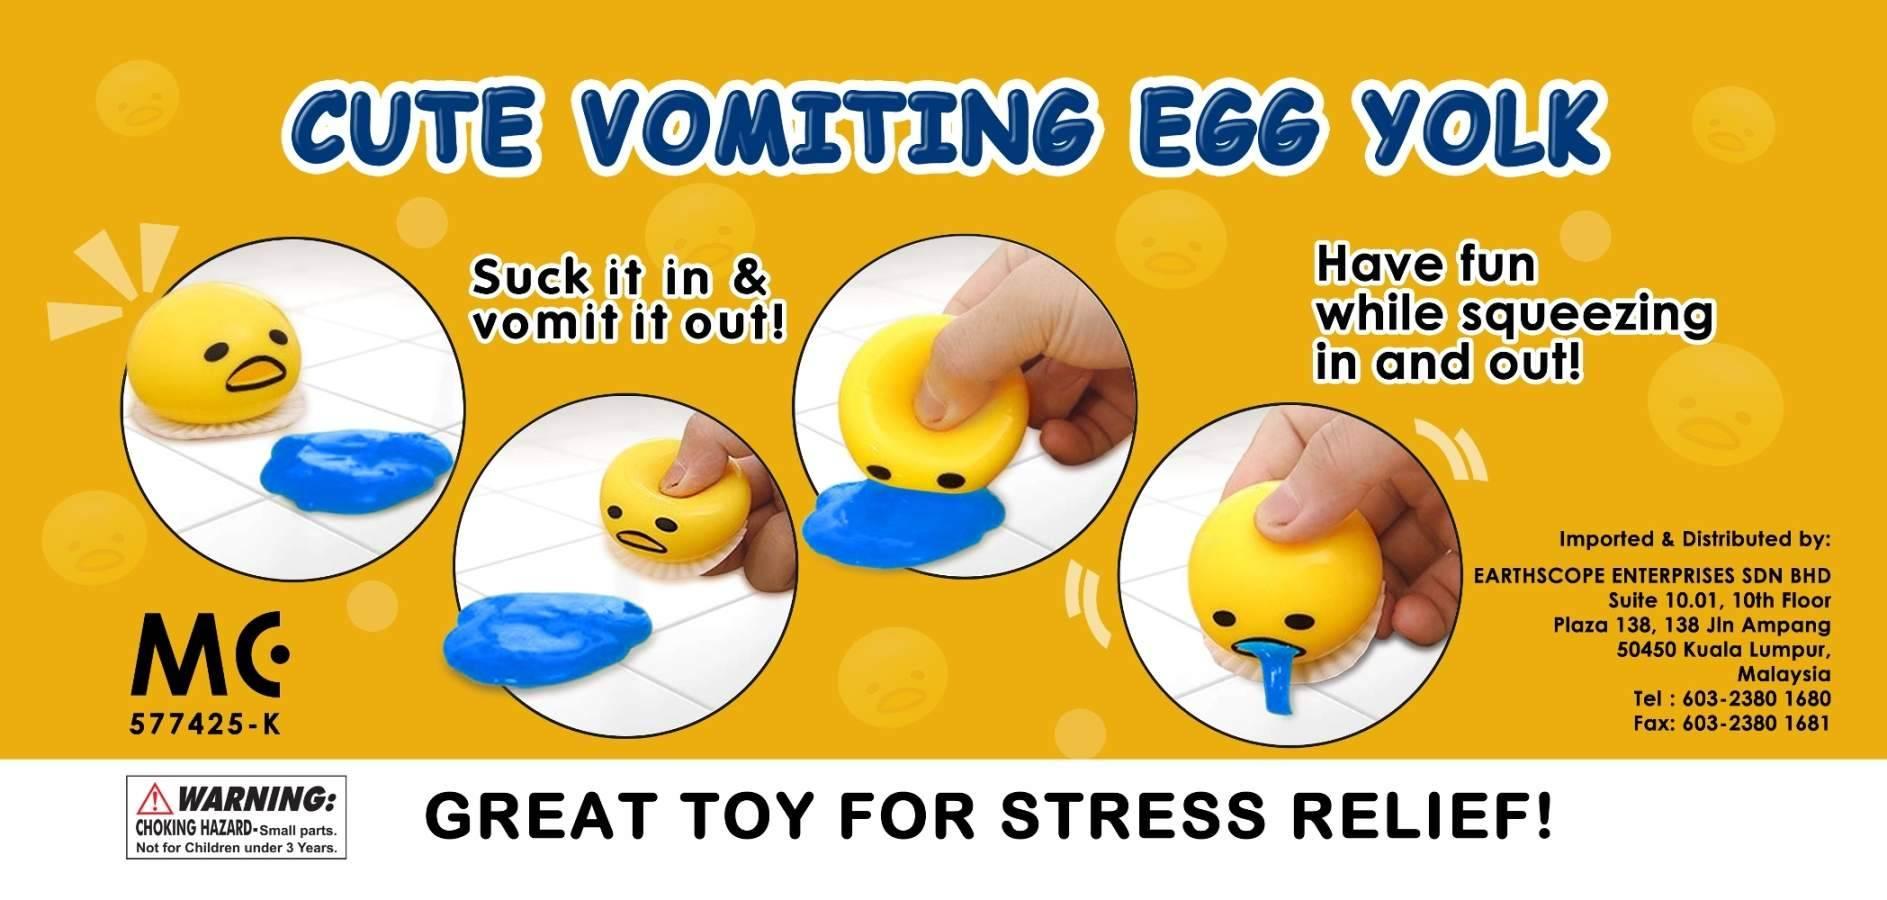 Vomiting Egg